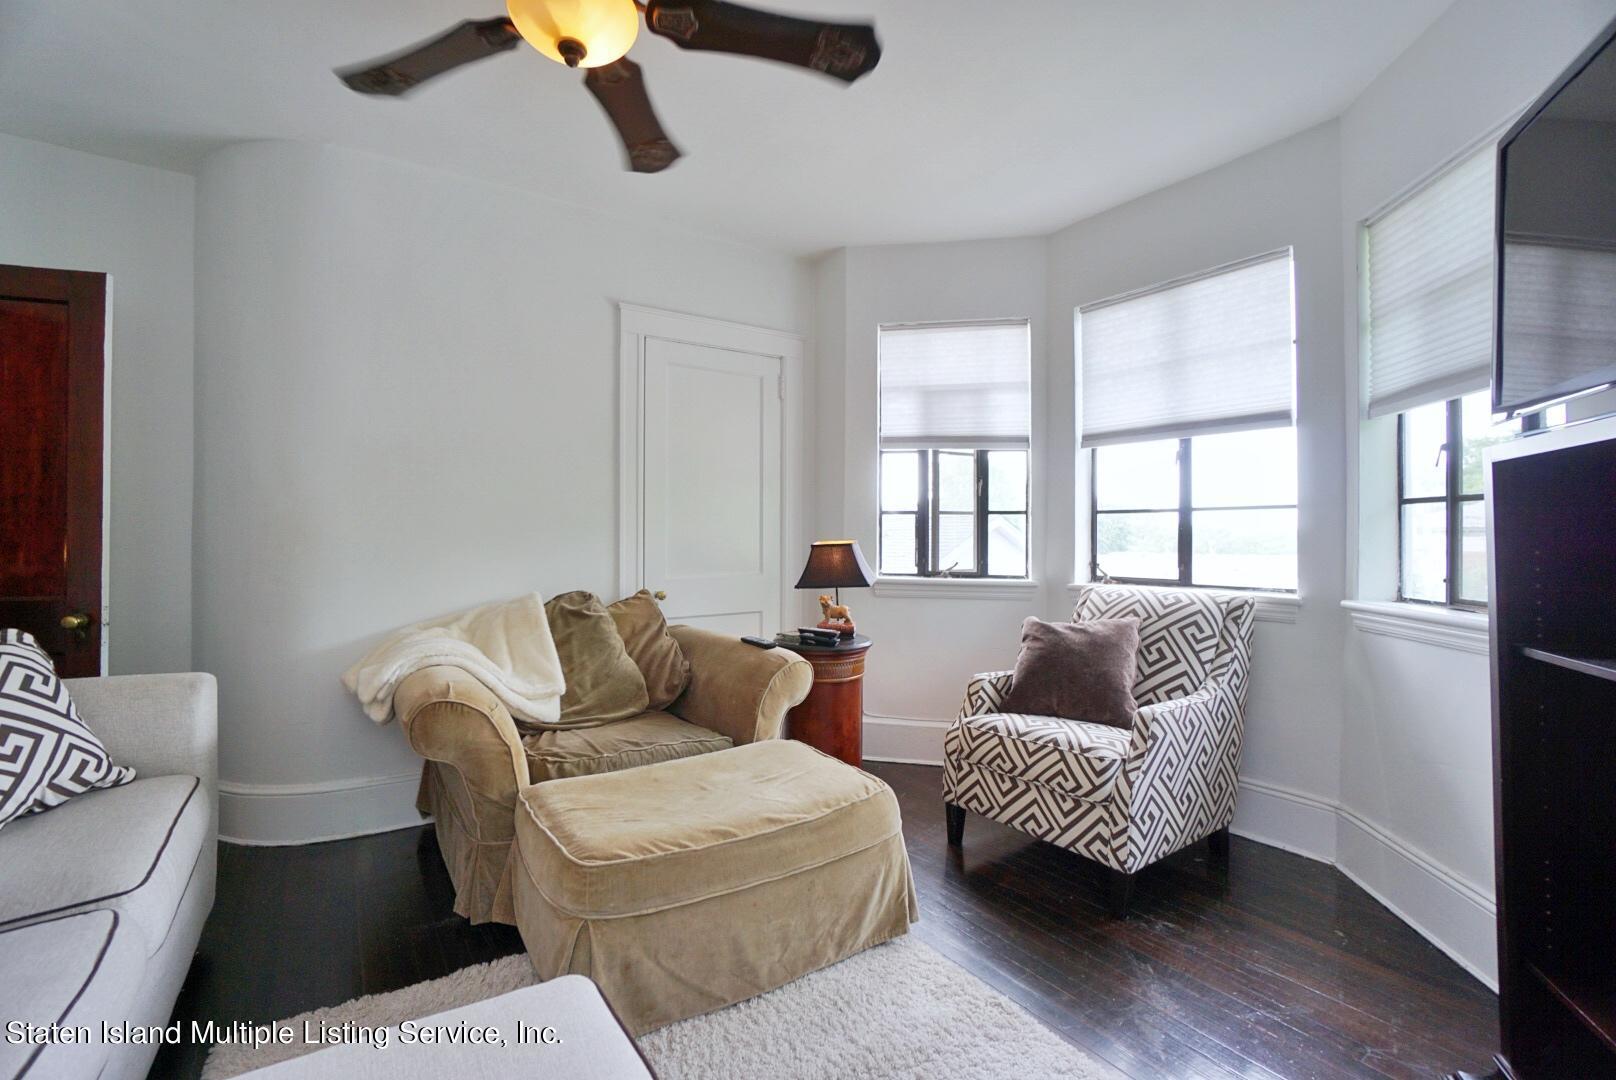 Single Family - Detached 311 Bement Avenue  Staten Island, NY 10310, MLS-1147133-28